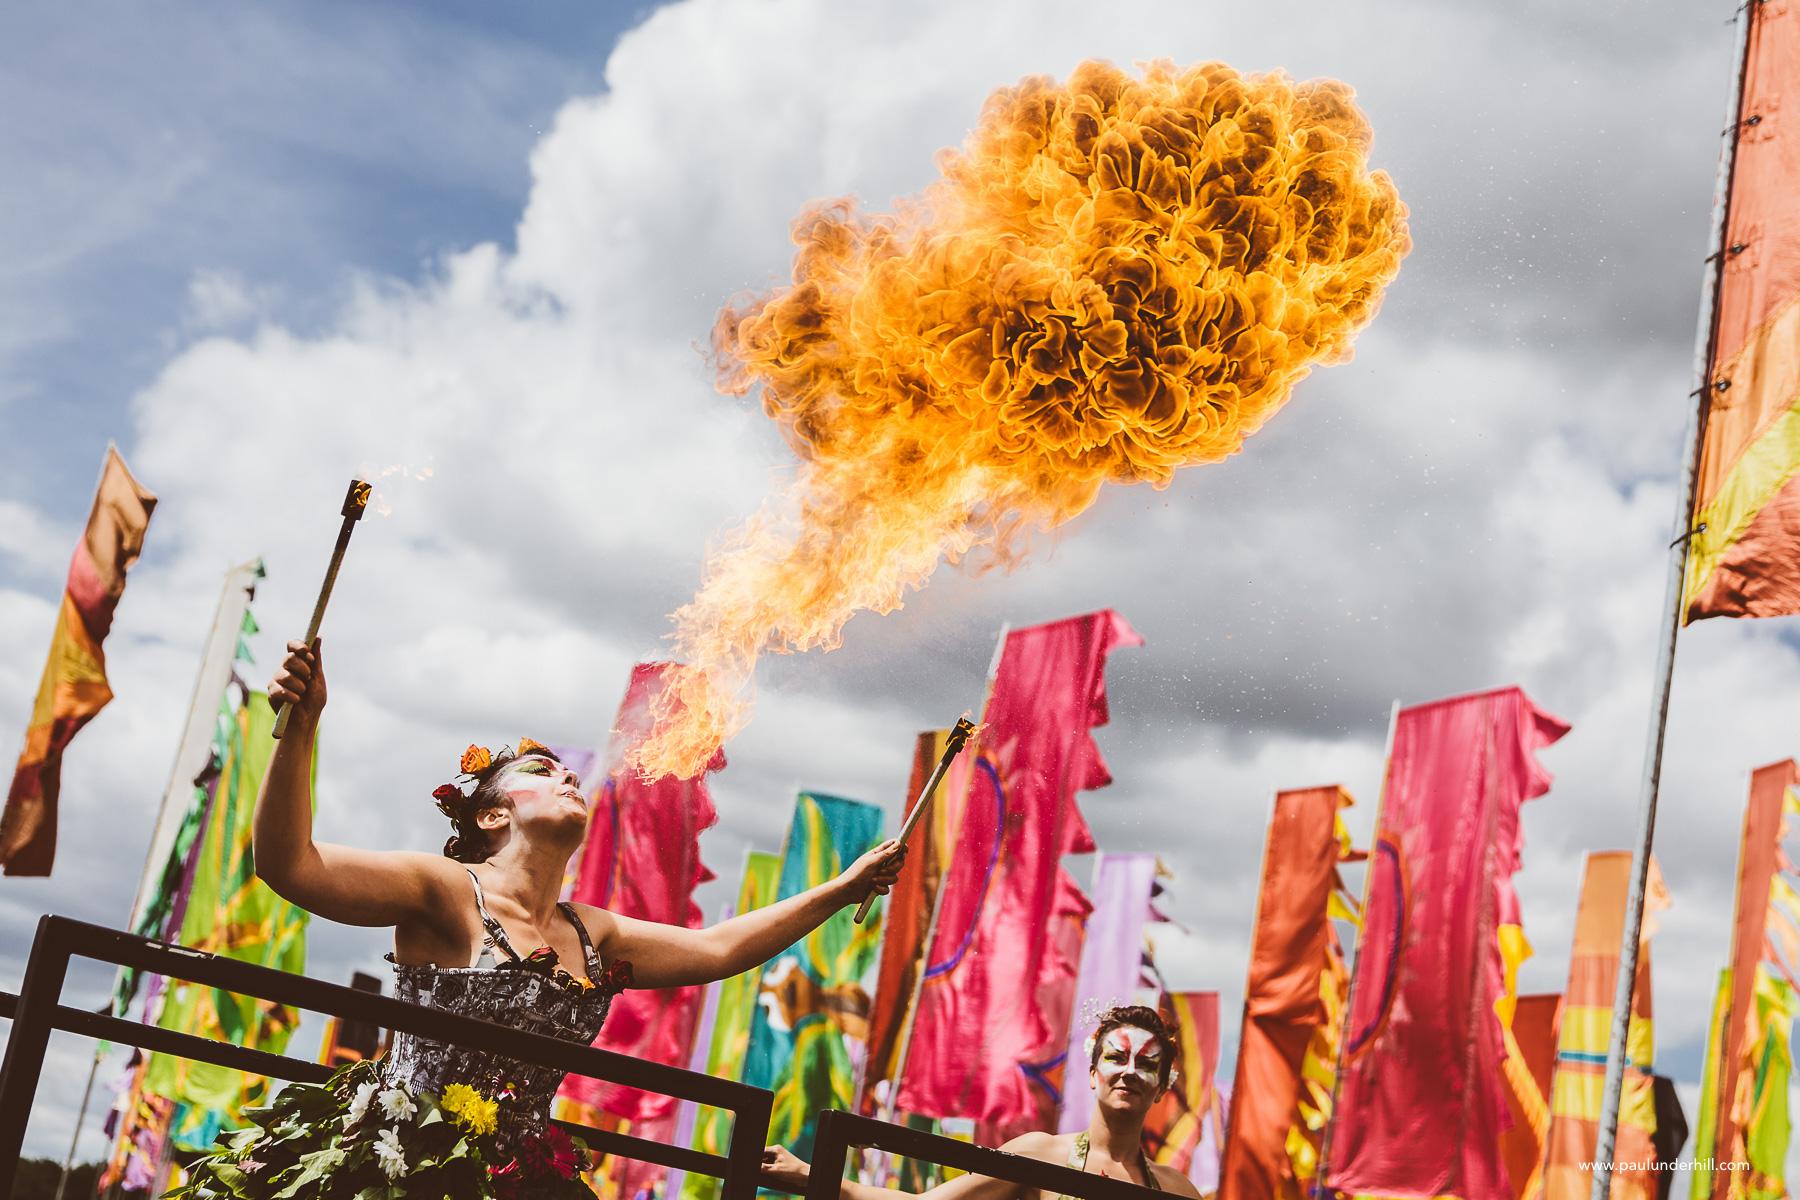 Festival-photography-00007